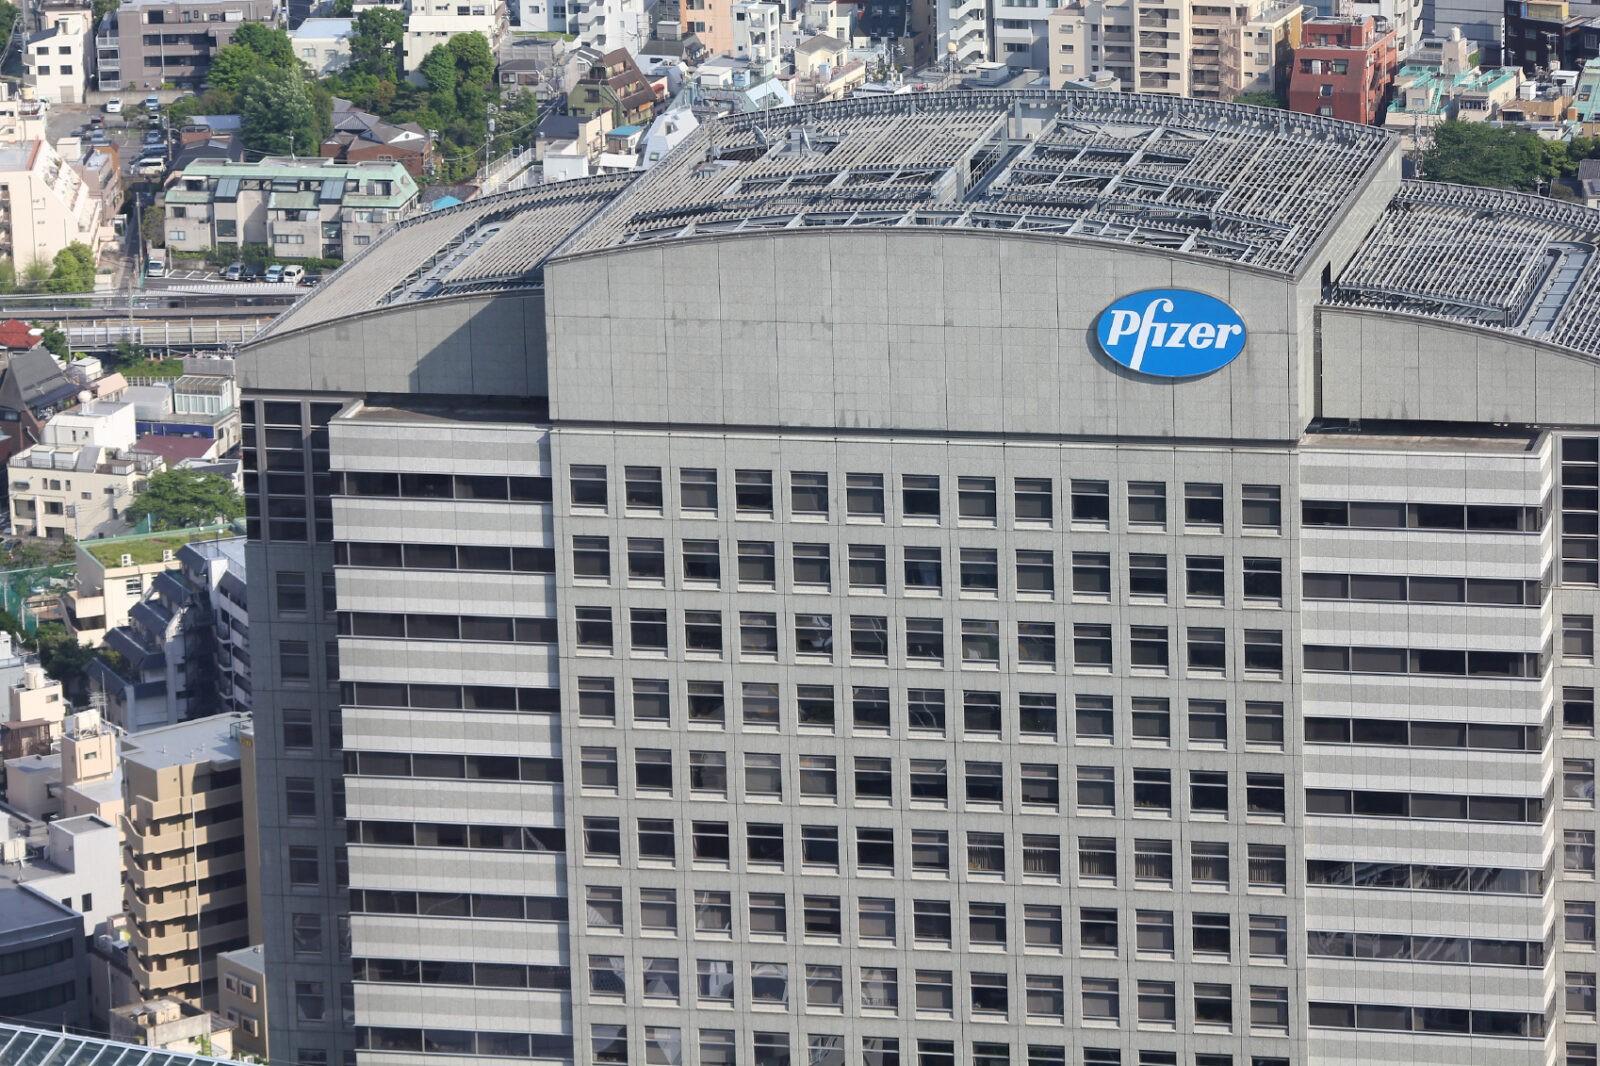 Pfizer Tokyo Headquarters